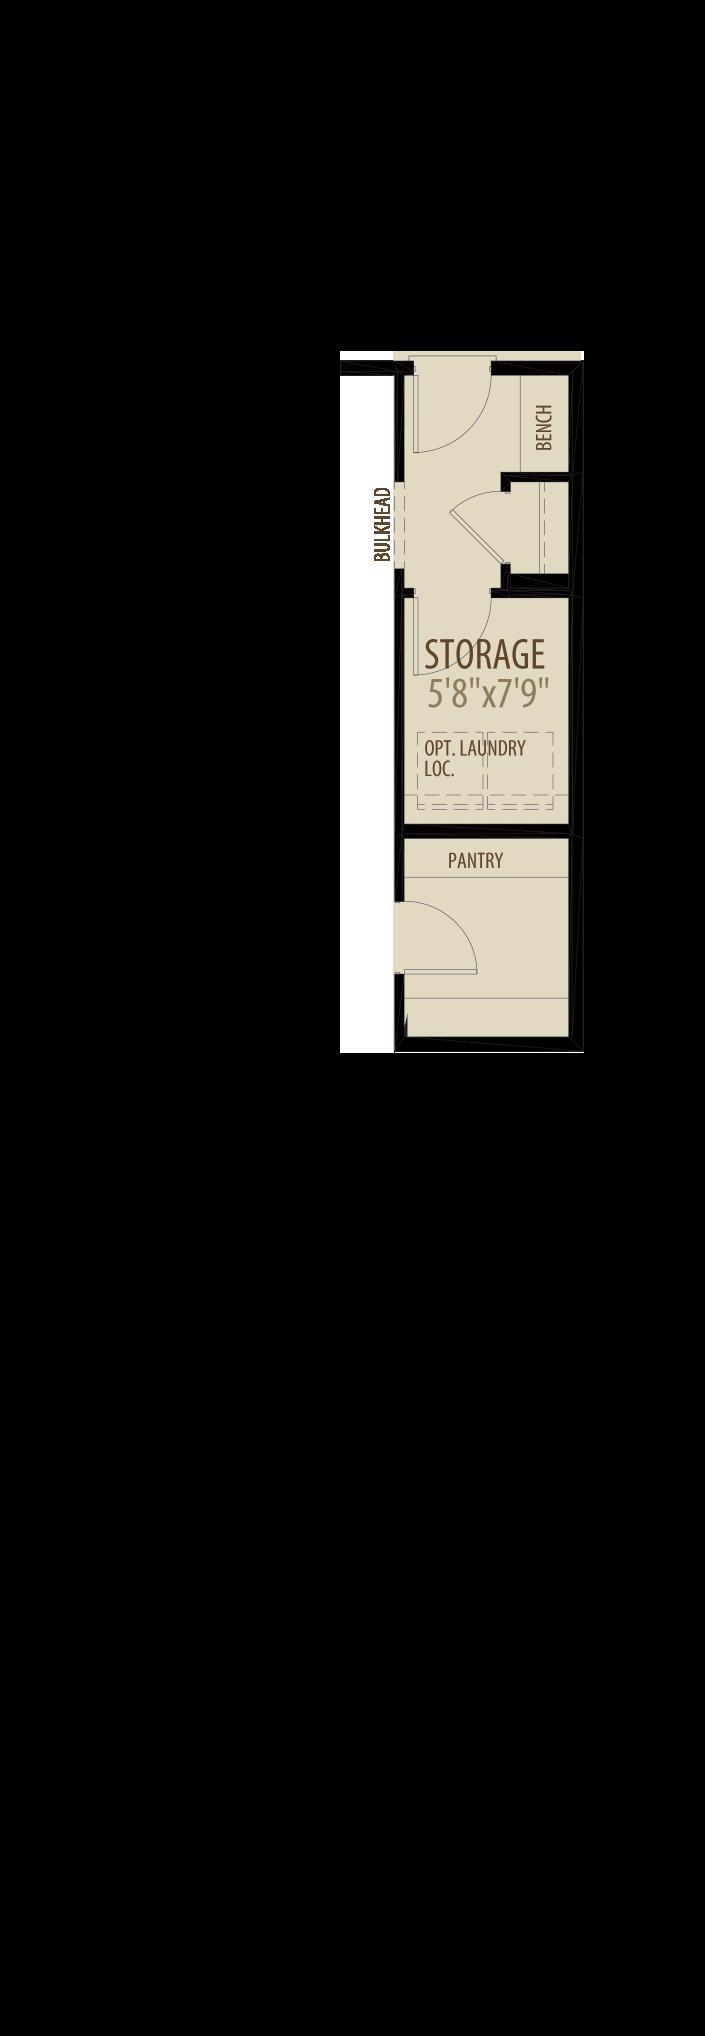 Option 1 Optional Rear Entry Storage